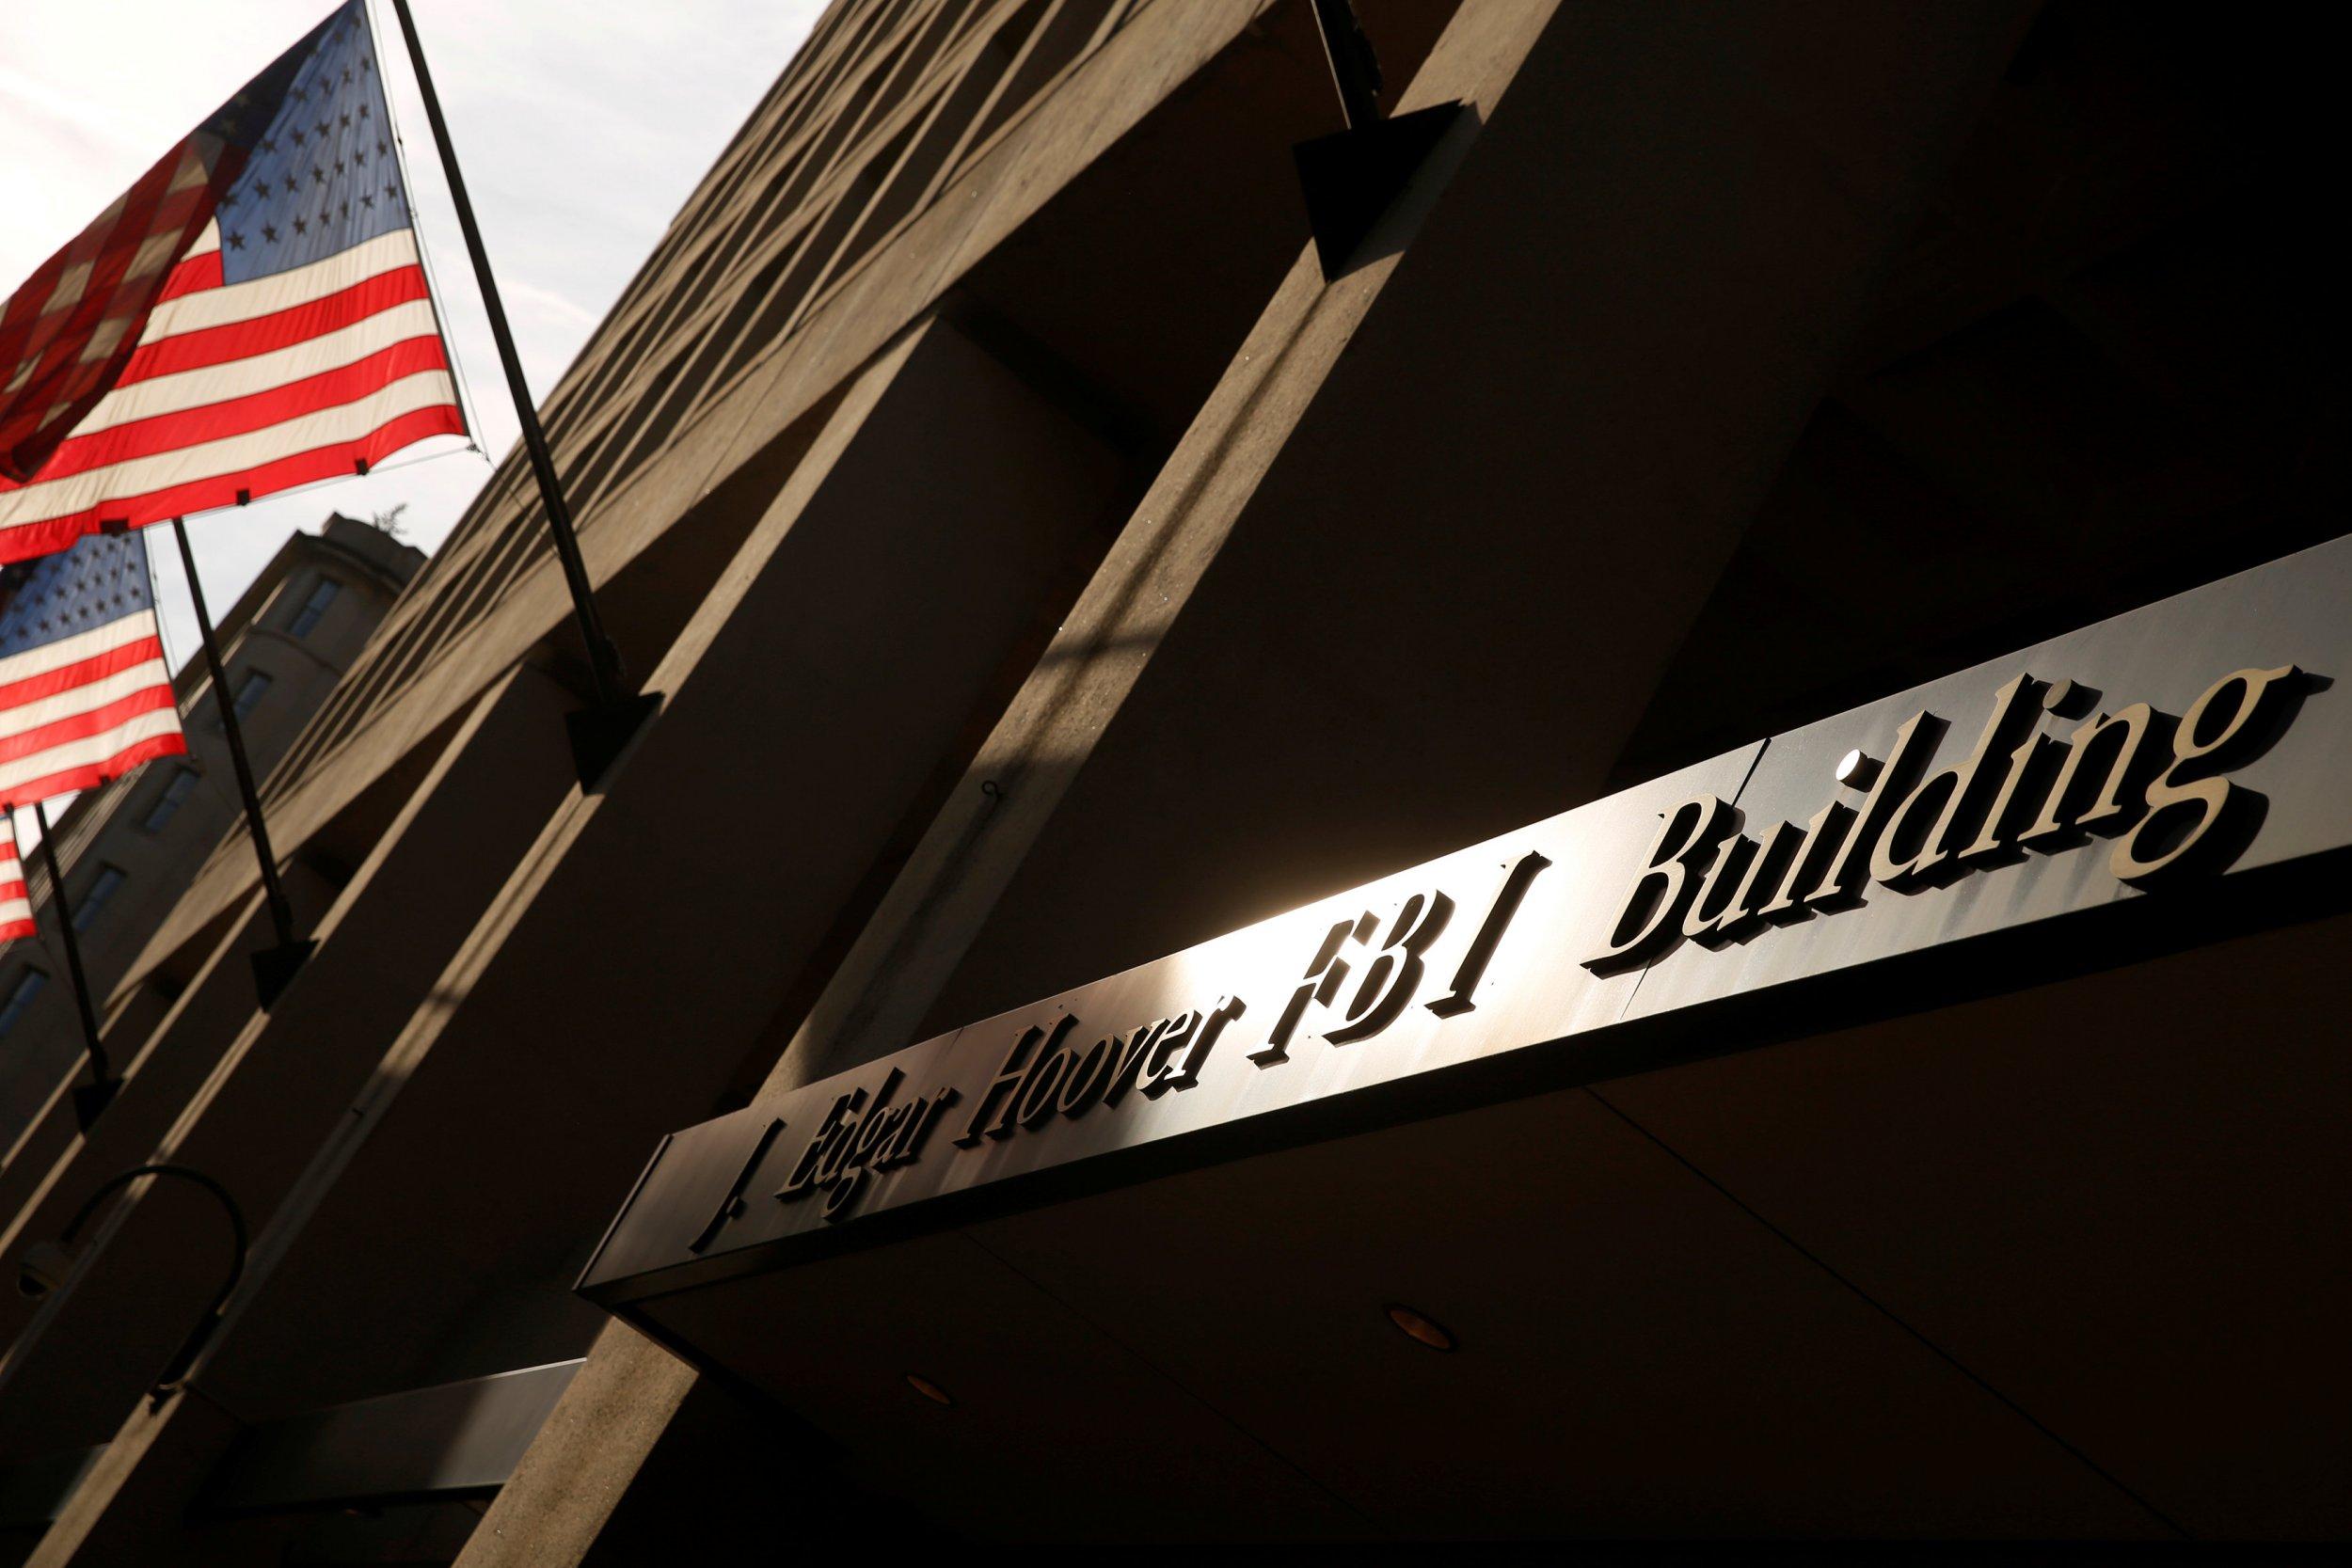 Federal Bureau of Investigation building in Washington